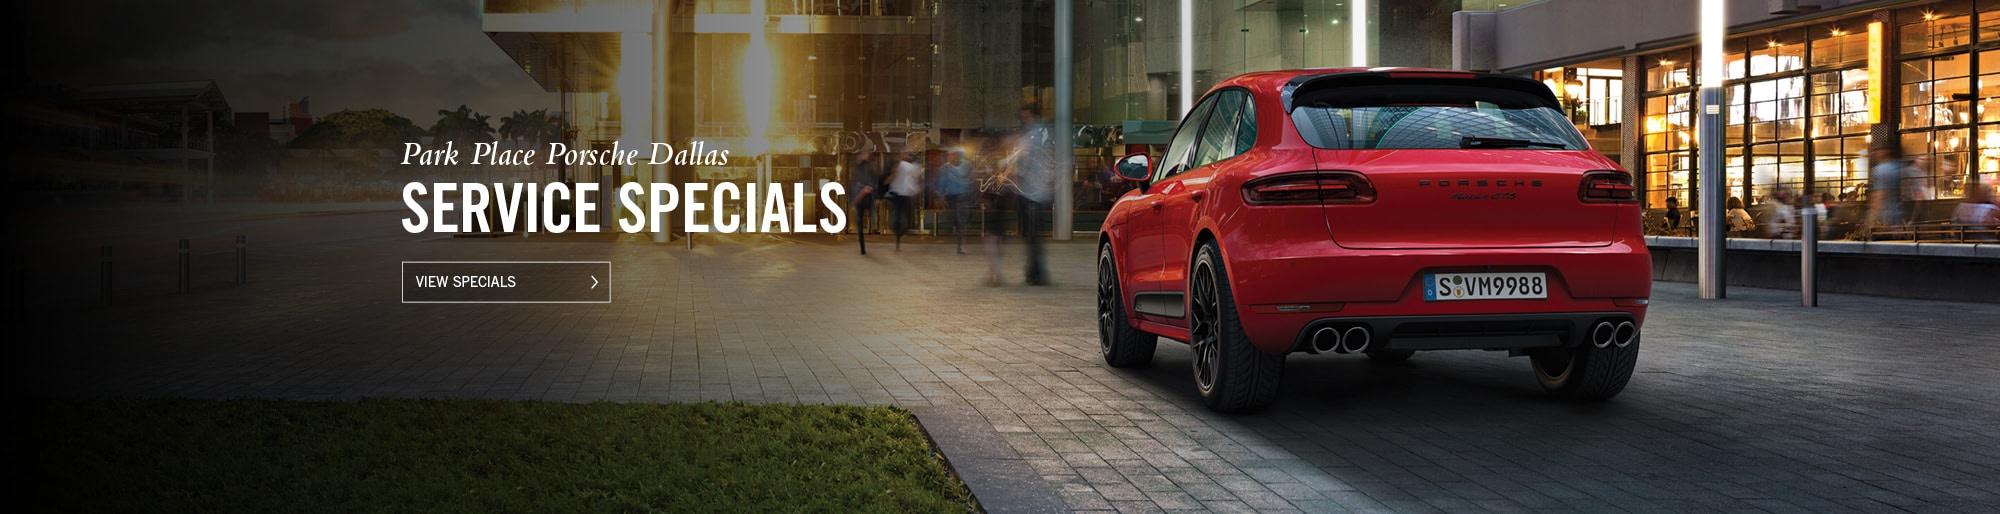 New Porsche Dealer Dallas near Frisco & Allen   Park Place